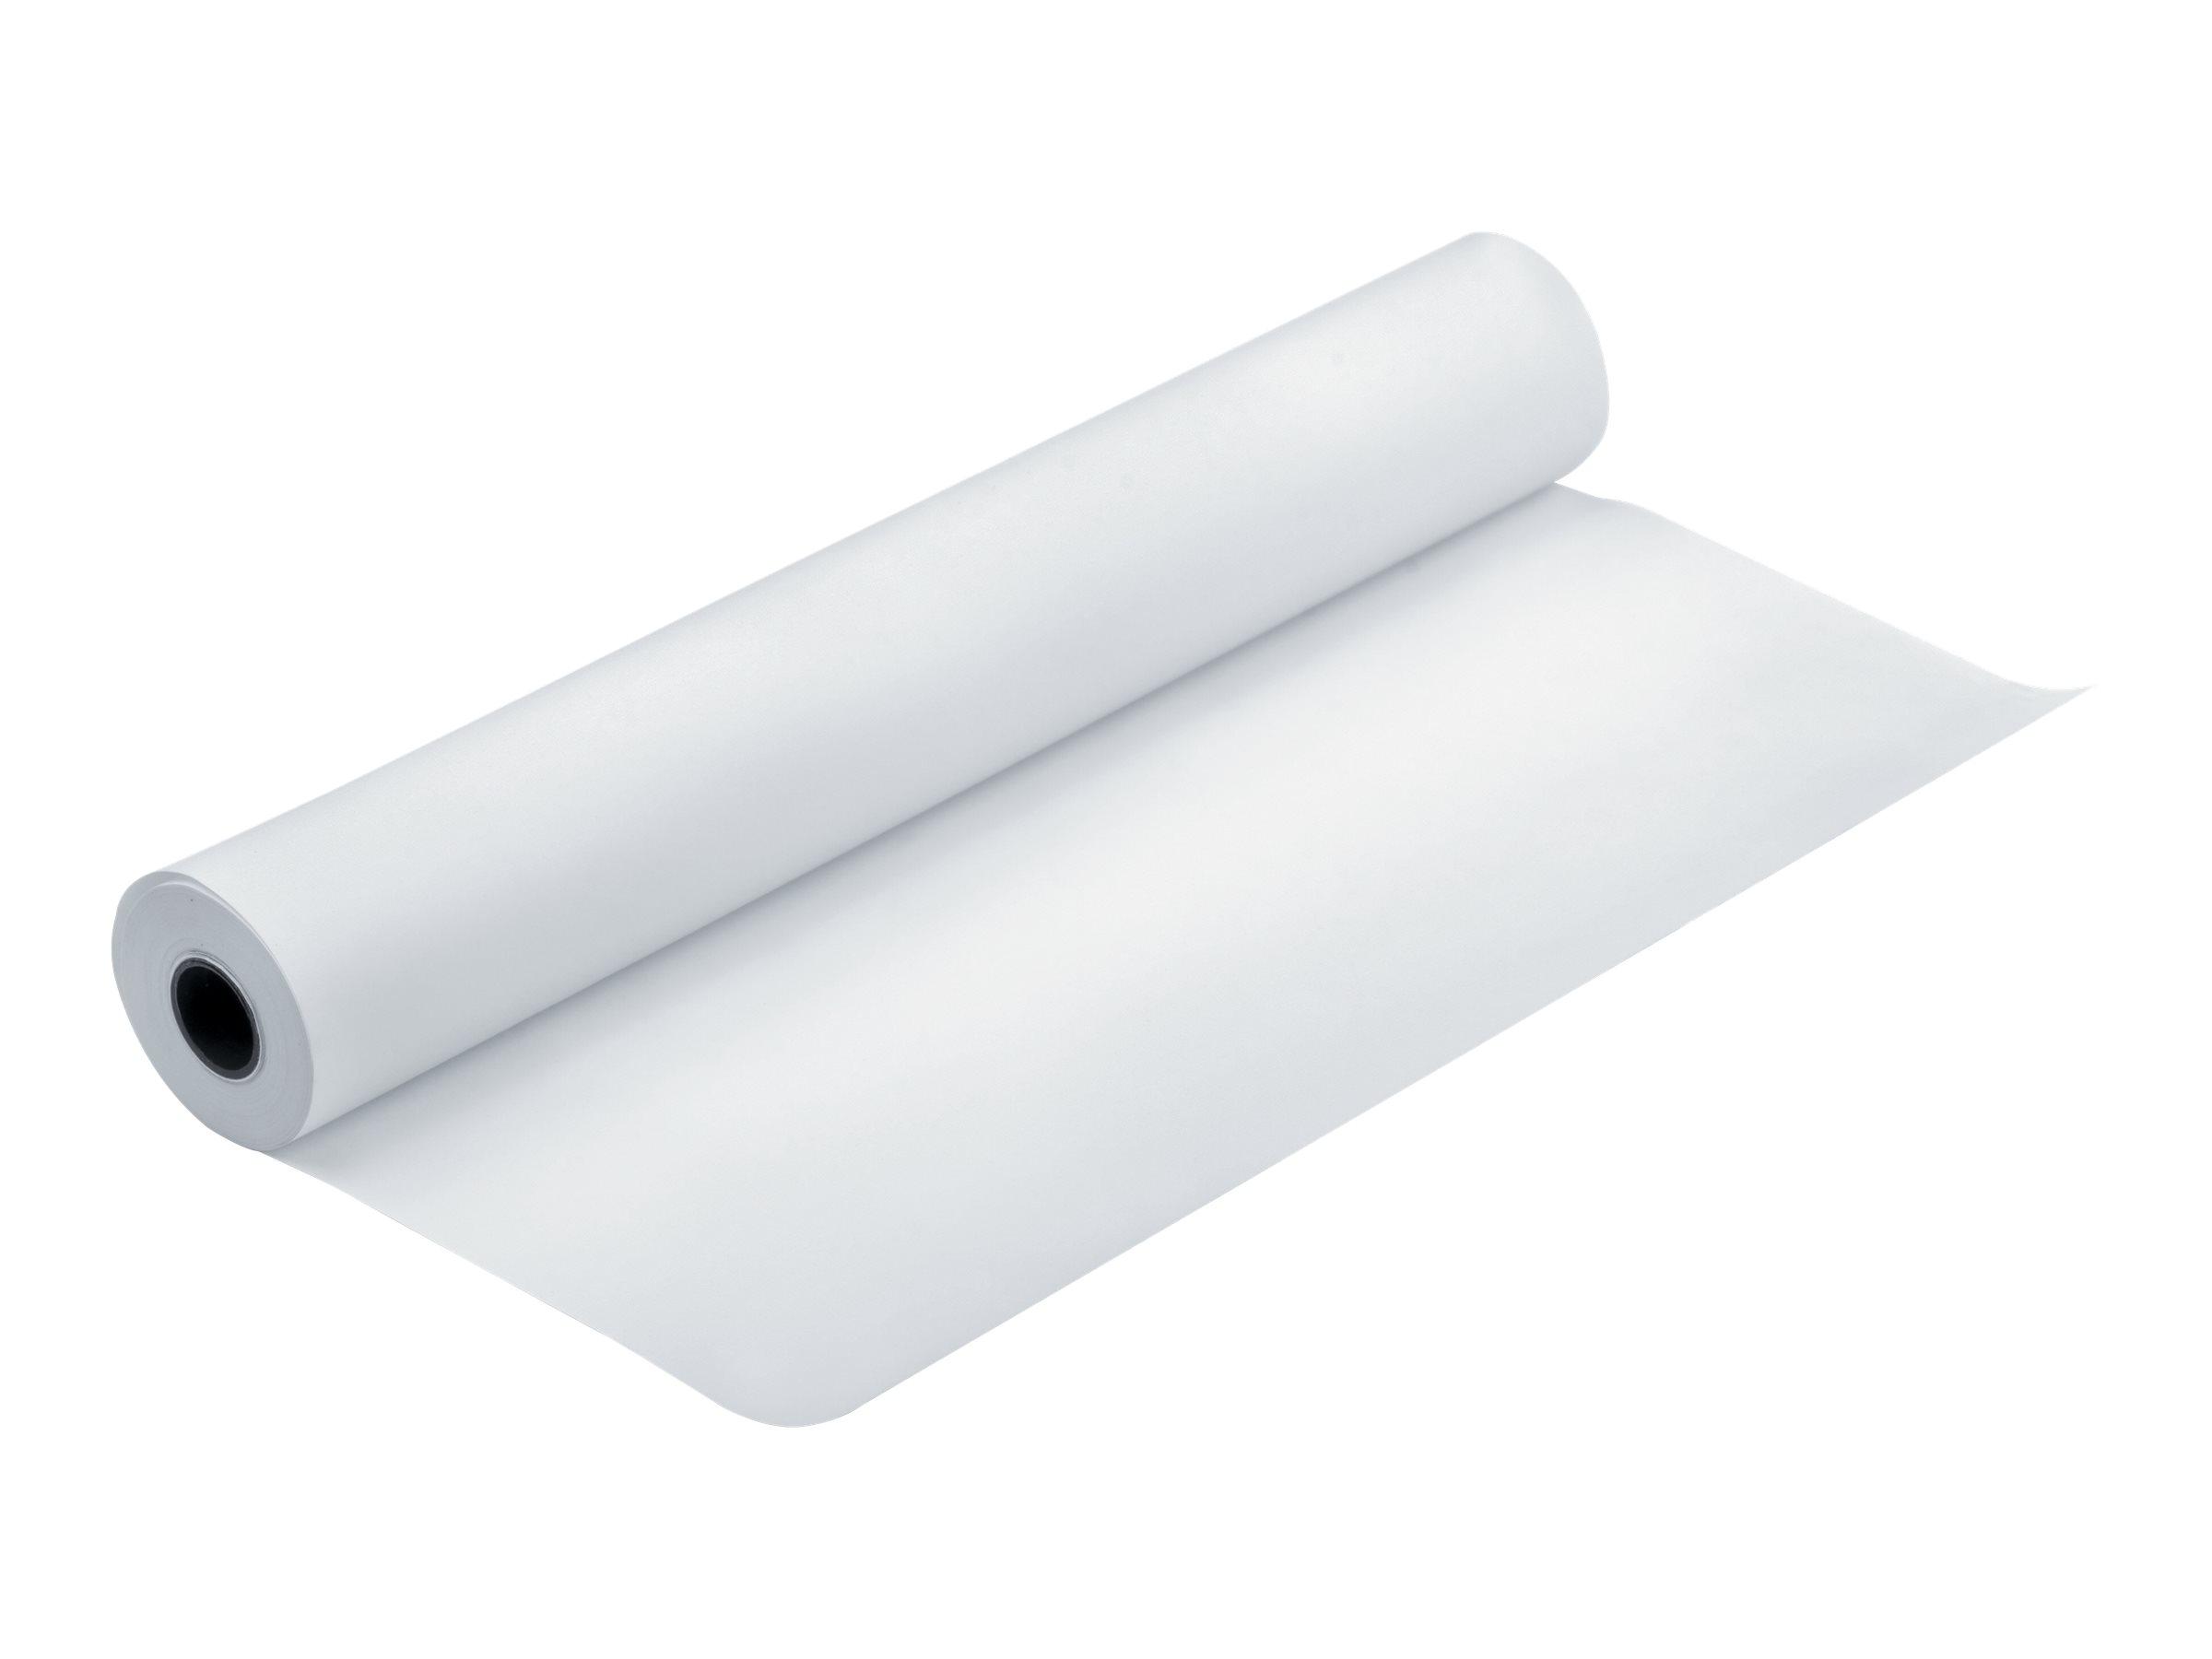 Epson - Glänzend - Rolle (111,8 cm x 30,5 m) - 250 g/m² - 1 Rolle(n) Fotopapier - für Stylus Pro 11880, Pro 98XX; SureColor SC-P